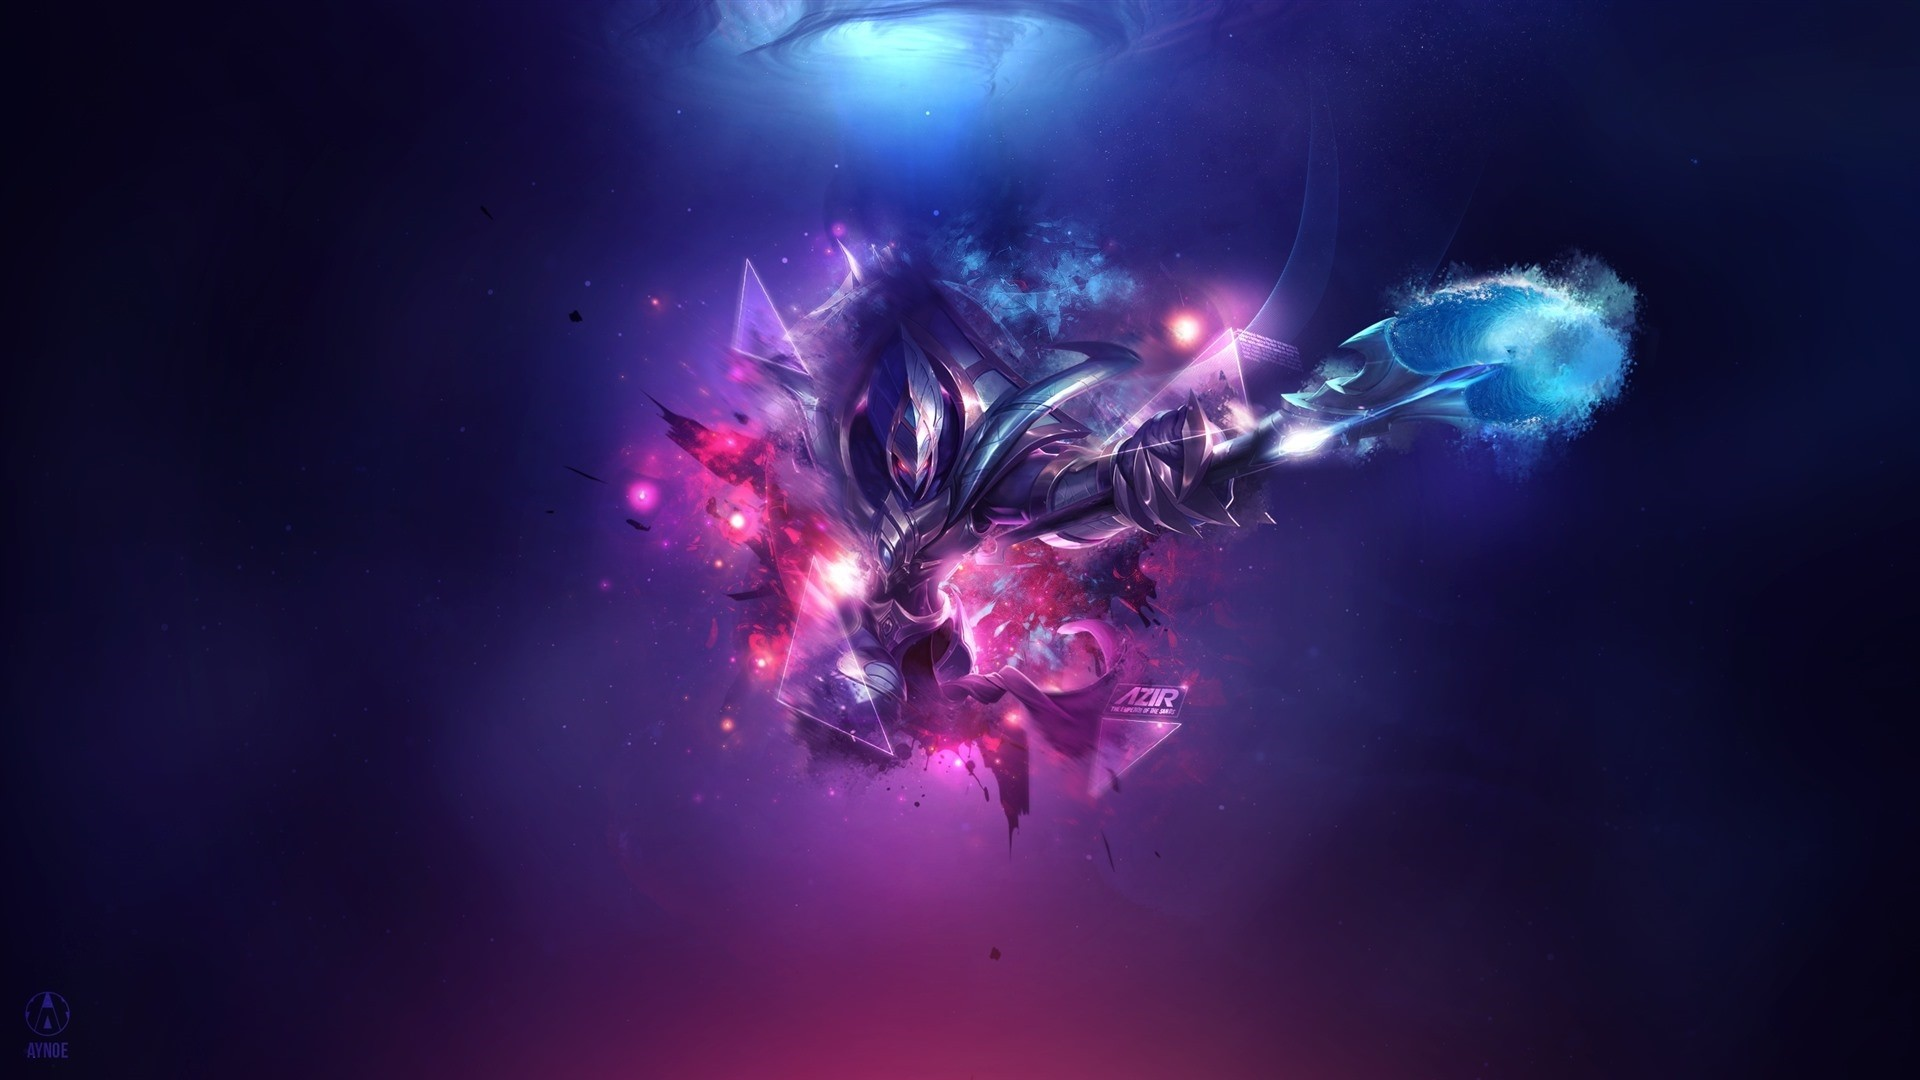 League Of Legends Free Desktop Wallpaper